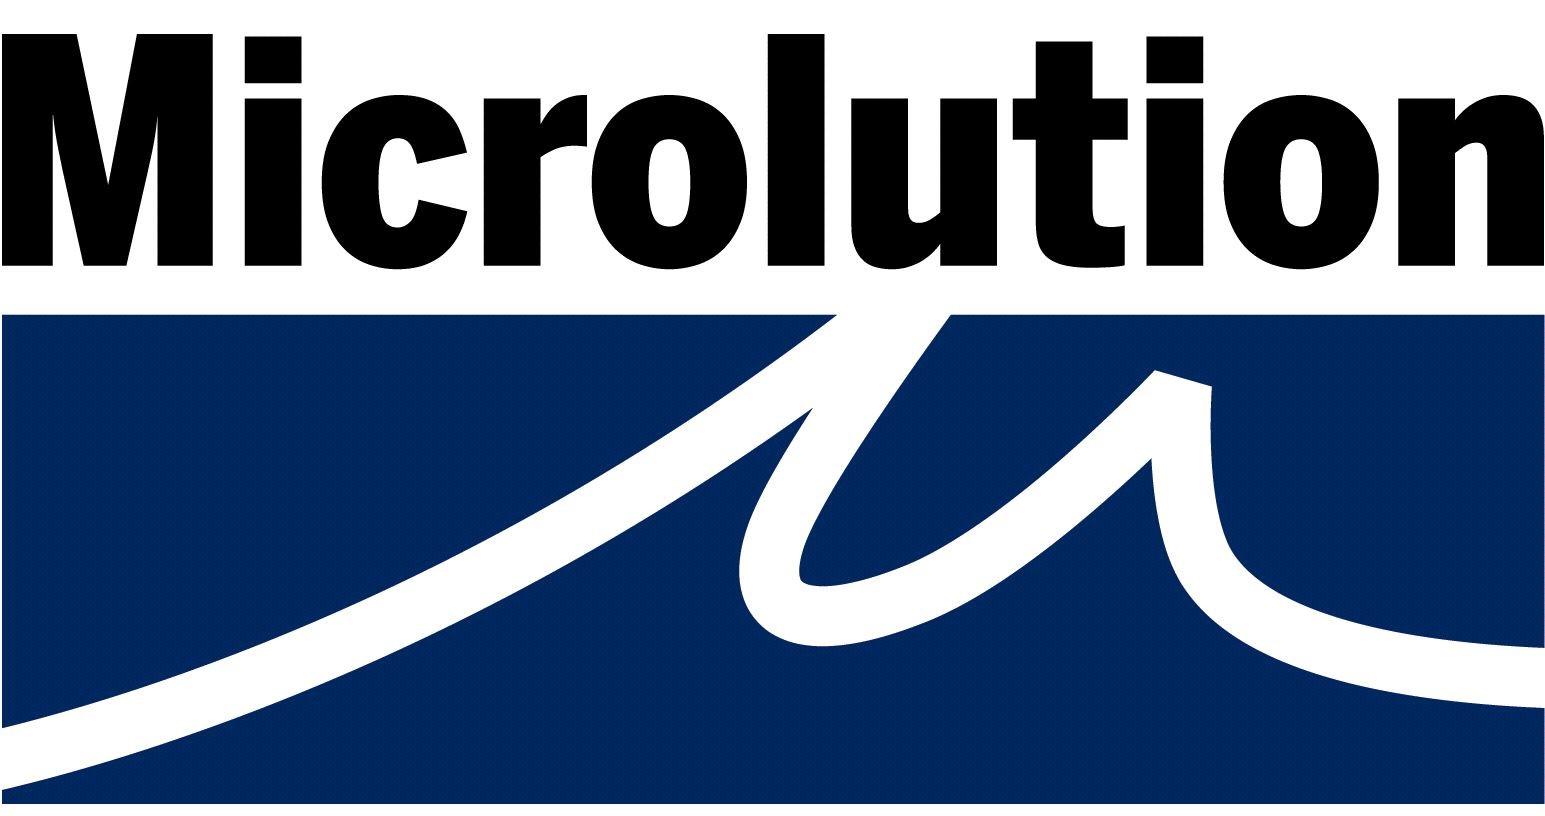 machinist logo. microlution logo machinist